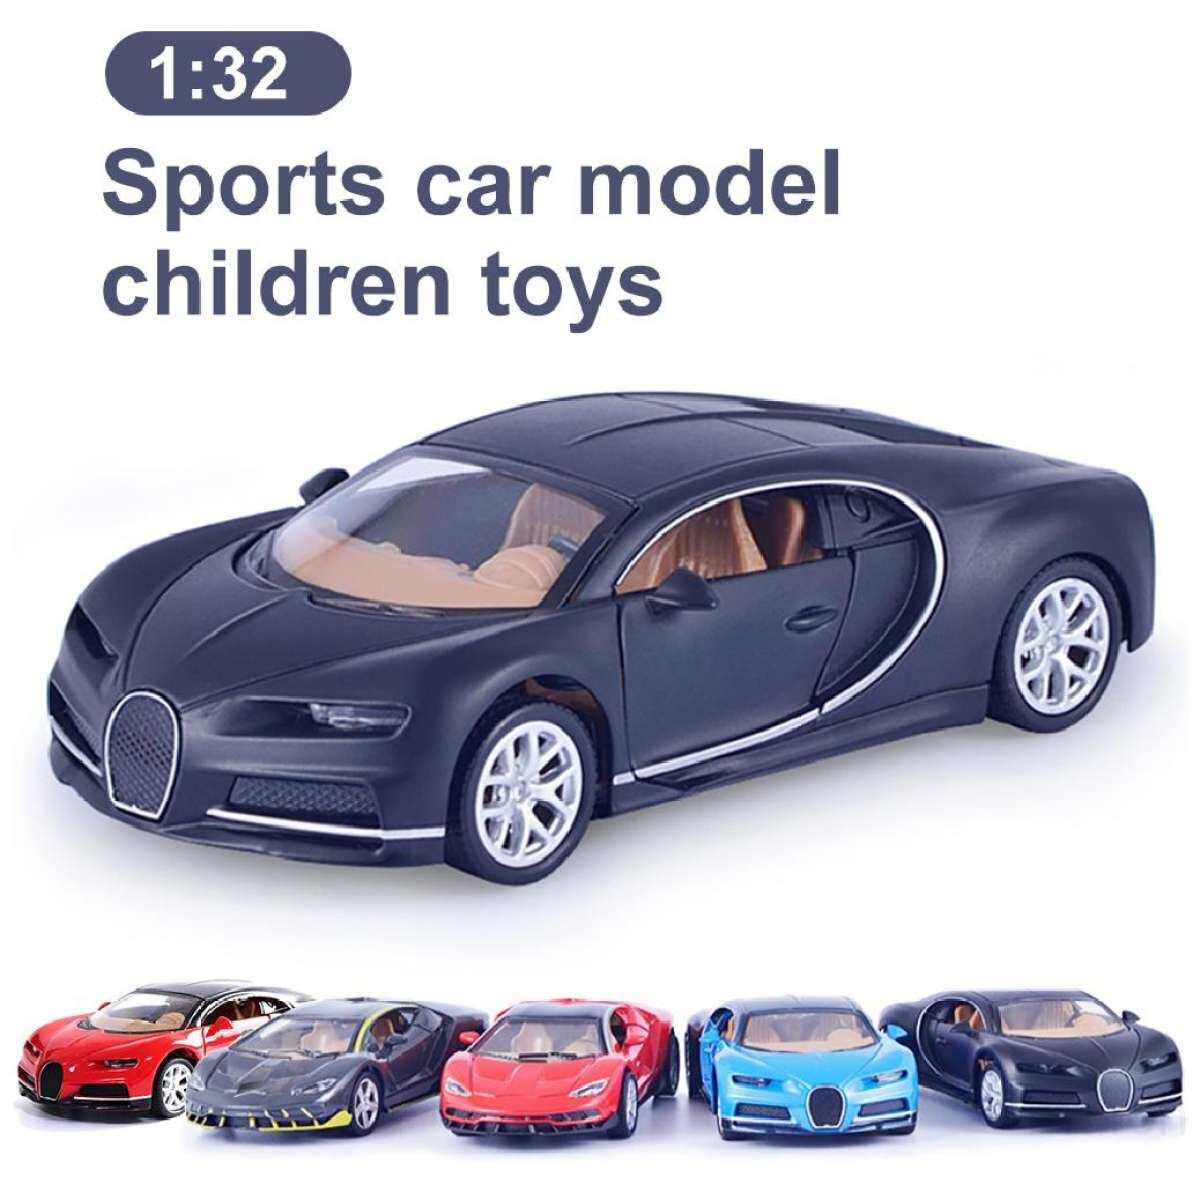 1 32 Alloy Simulation Car Model Of Lamborghini Bugatti Sports Car Cake Decoration For Children S Pull Back Toy Cvztik9p Lazada